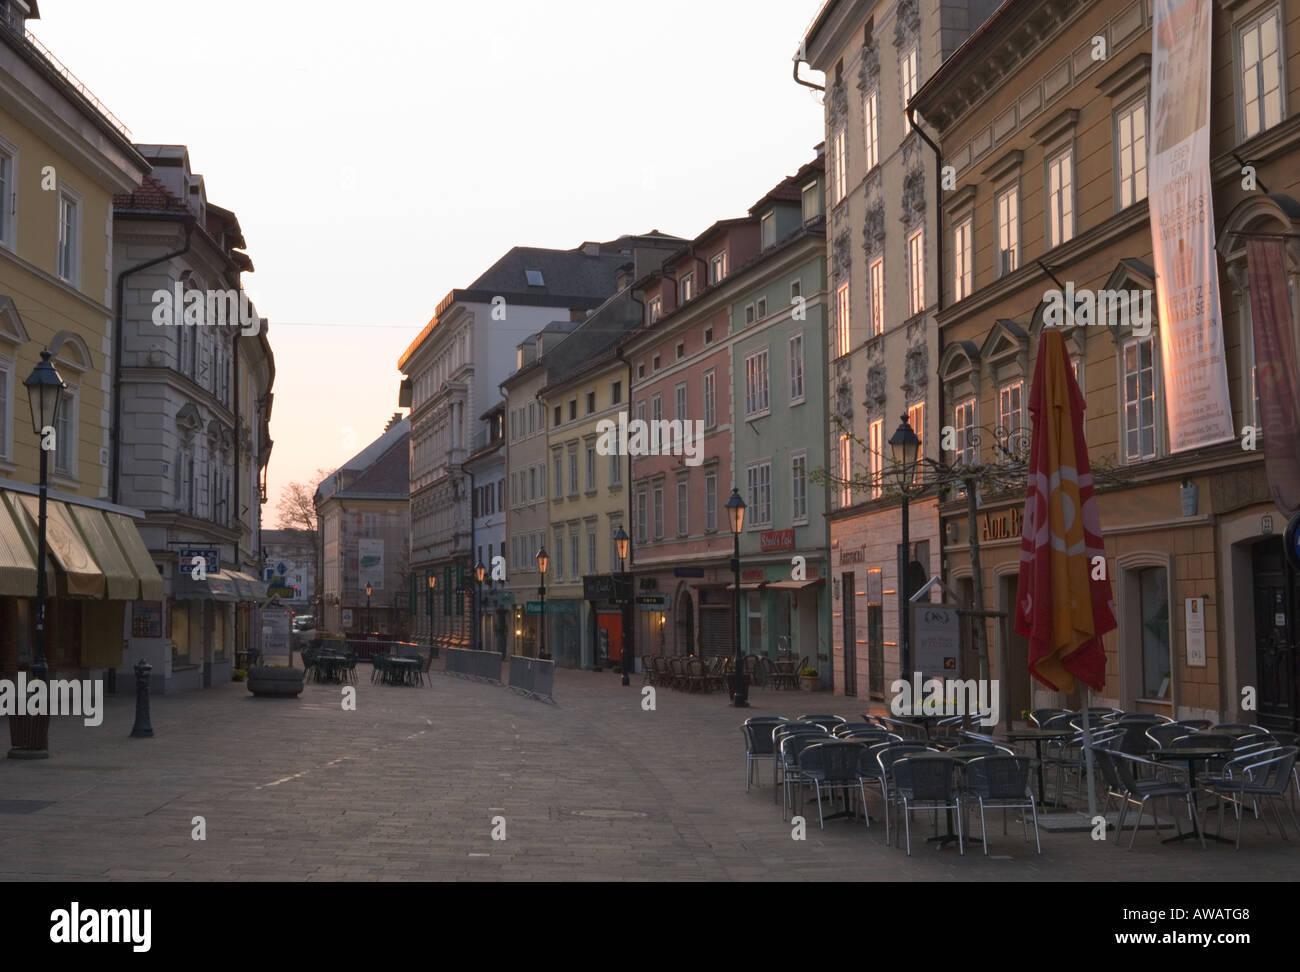 Alterplatz at sunrise Klagenfurt Austria - Stock Image